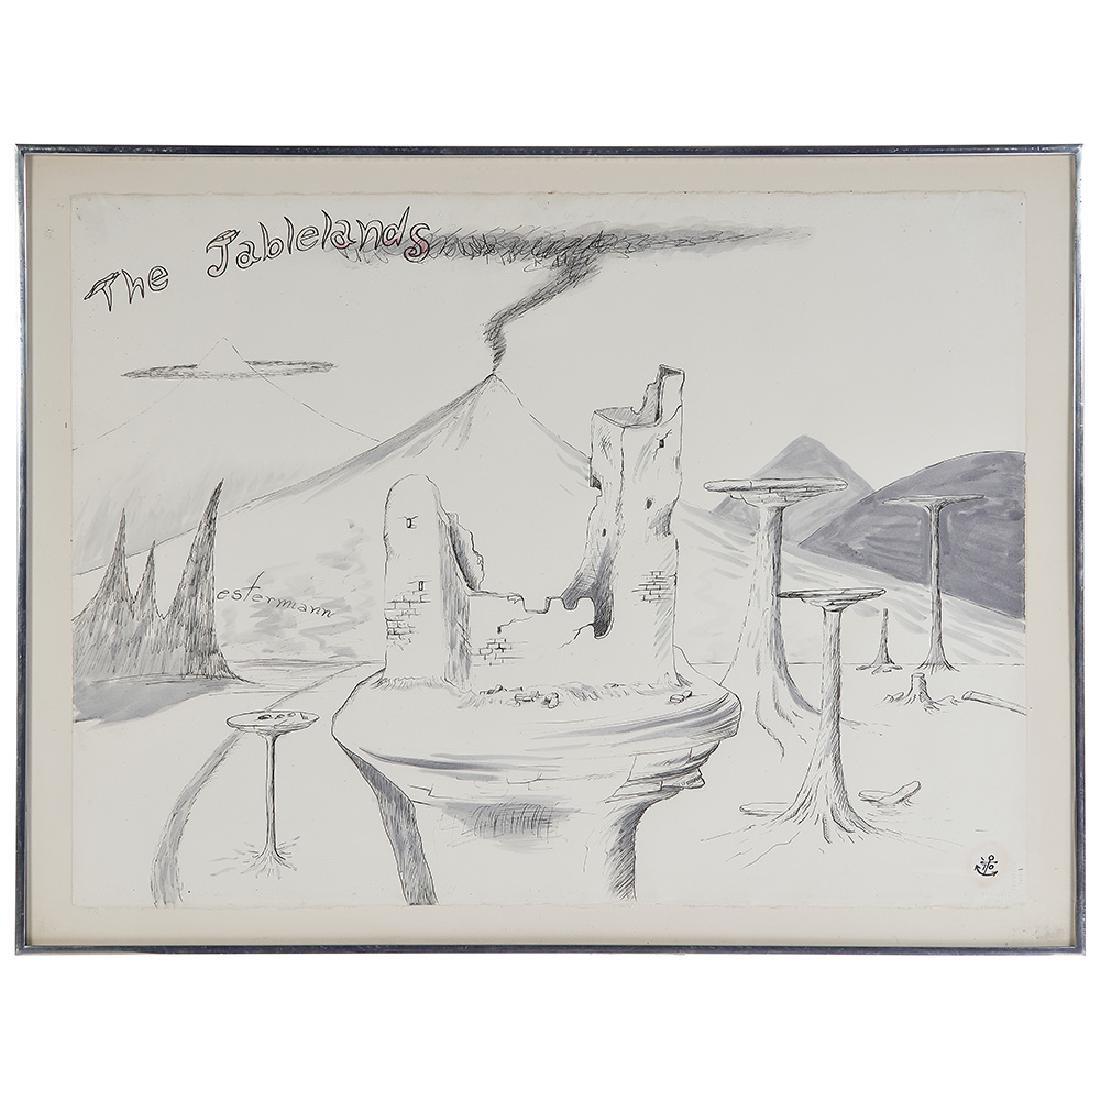 H.C. Westermann, The Tablelands, 1971 - 2